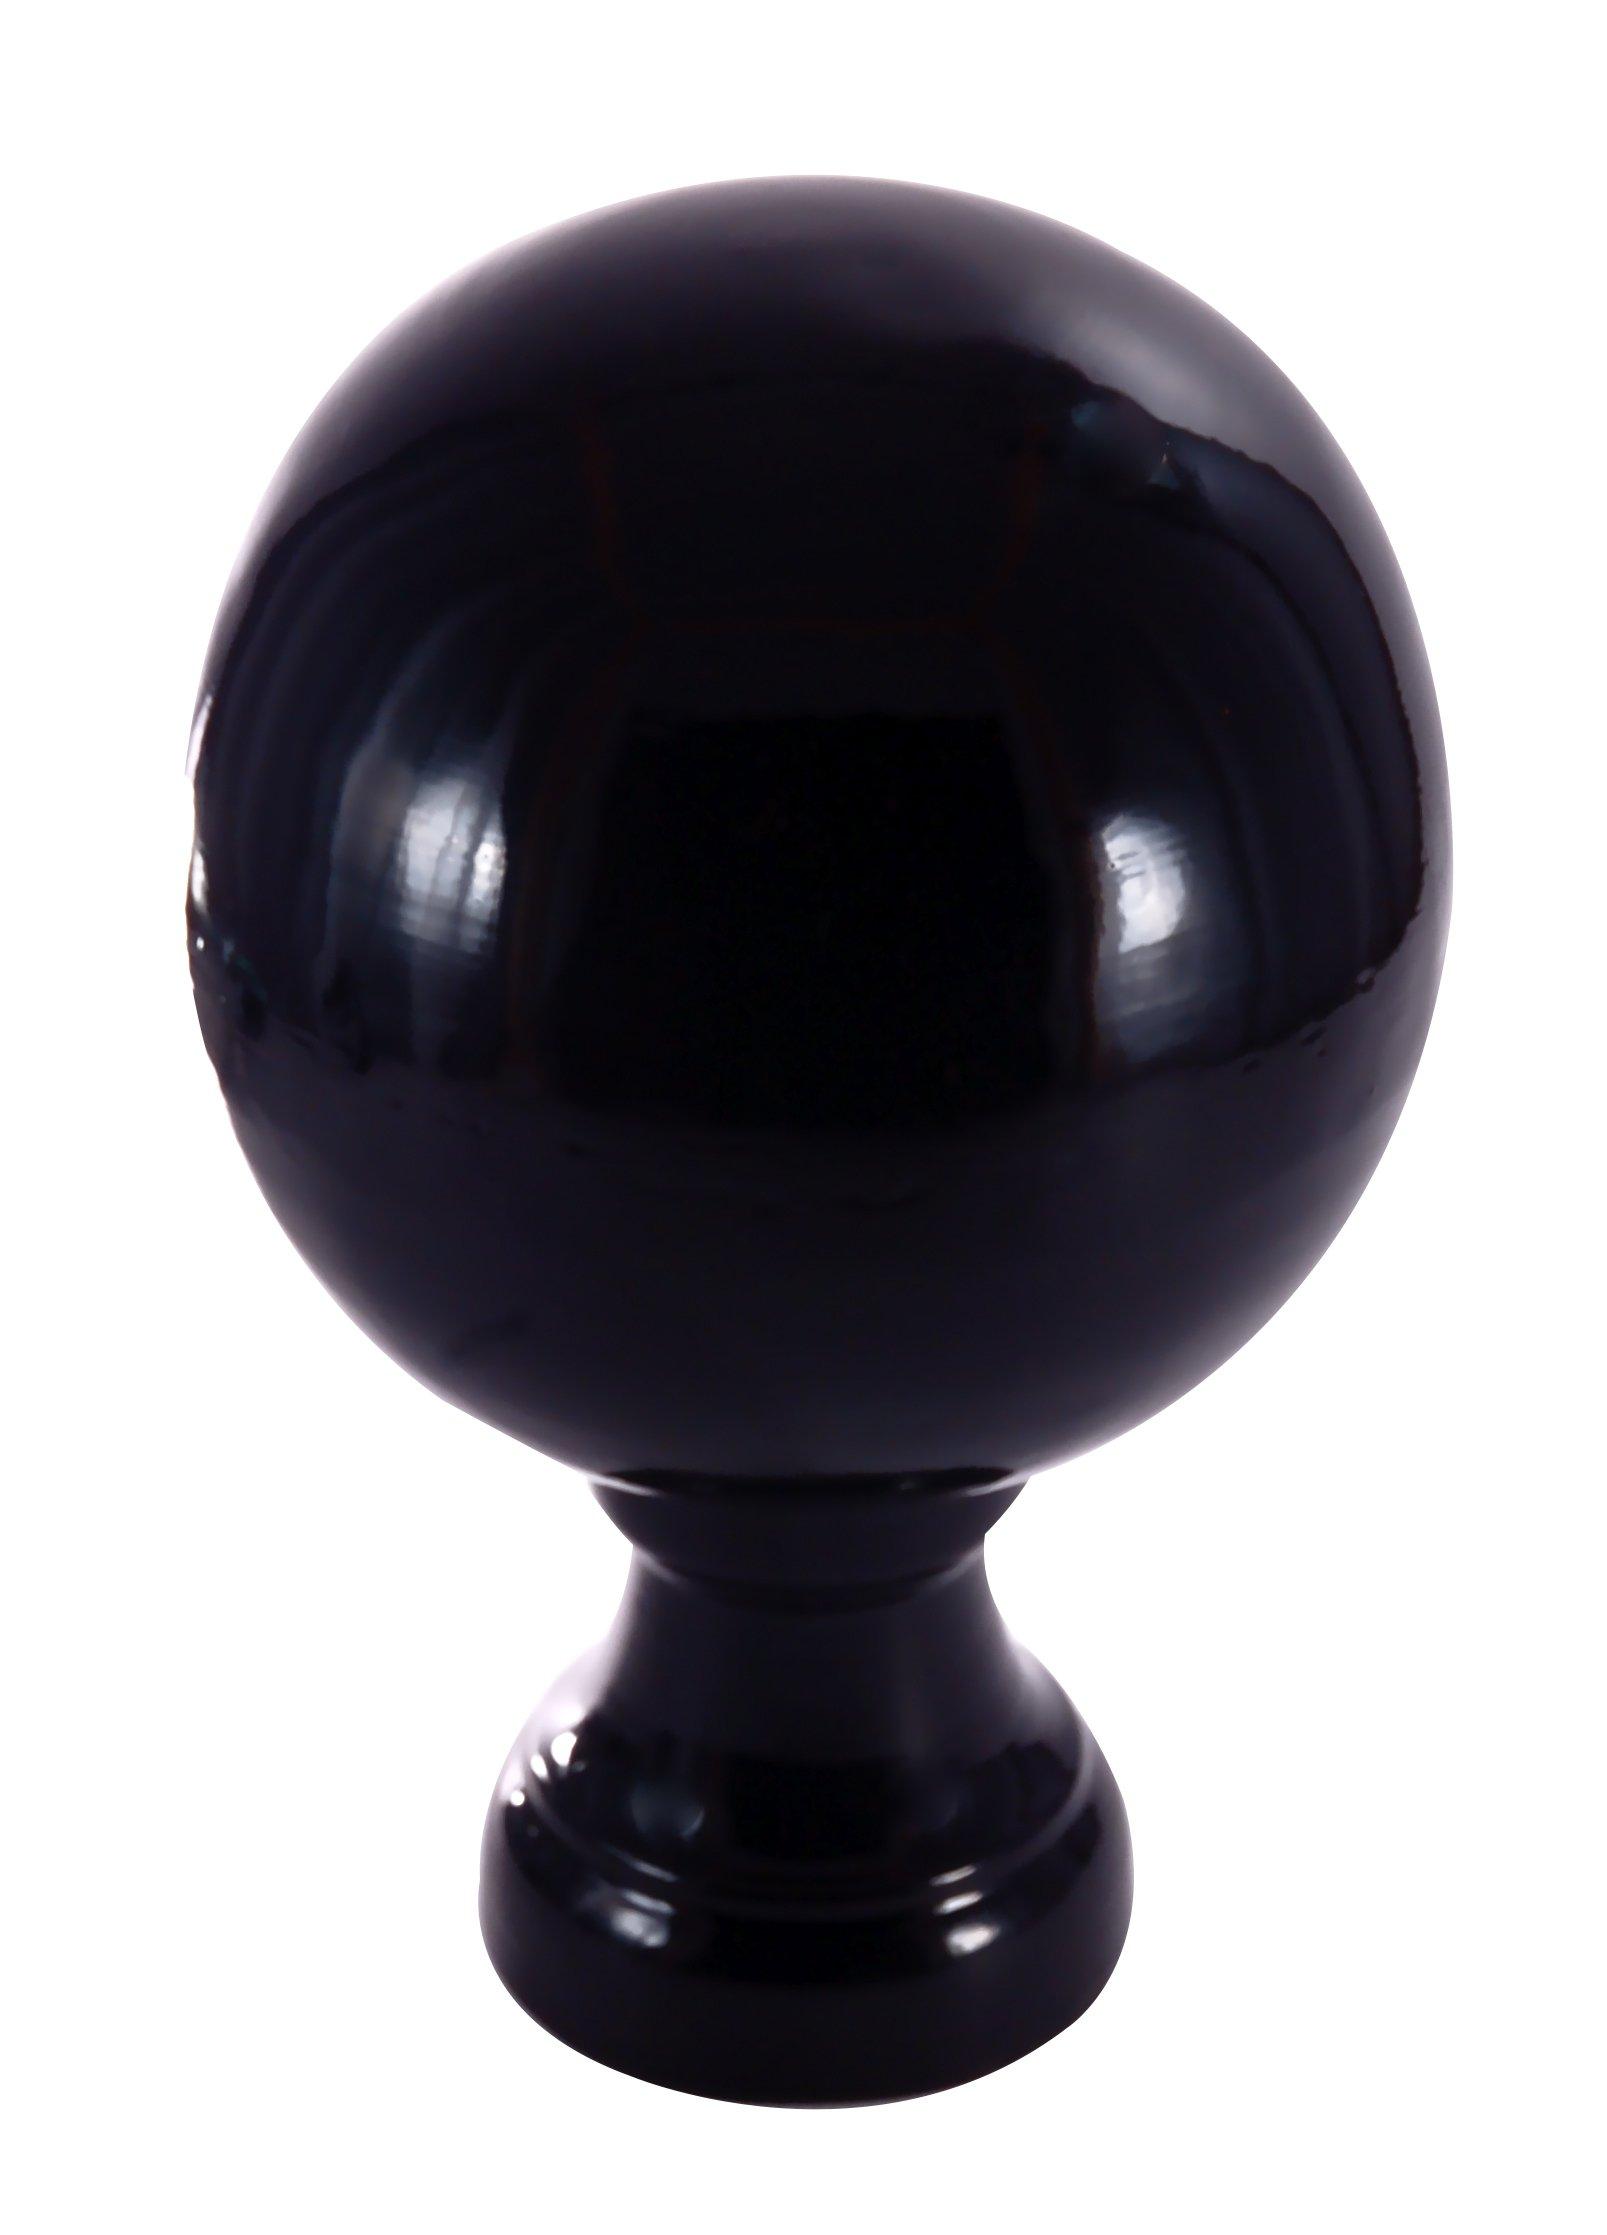 Dalvento Small Londoner Finial- Black Gloss by Dalvento (Image #1)